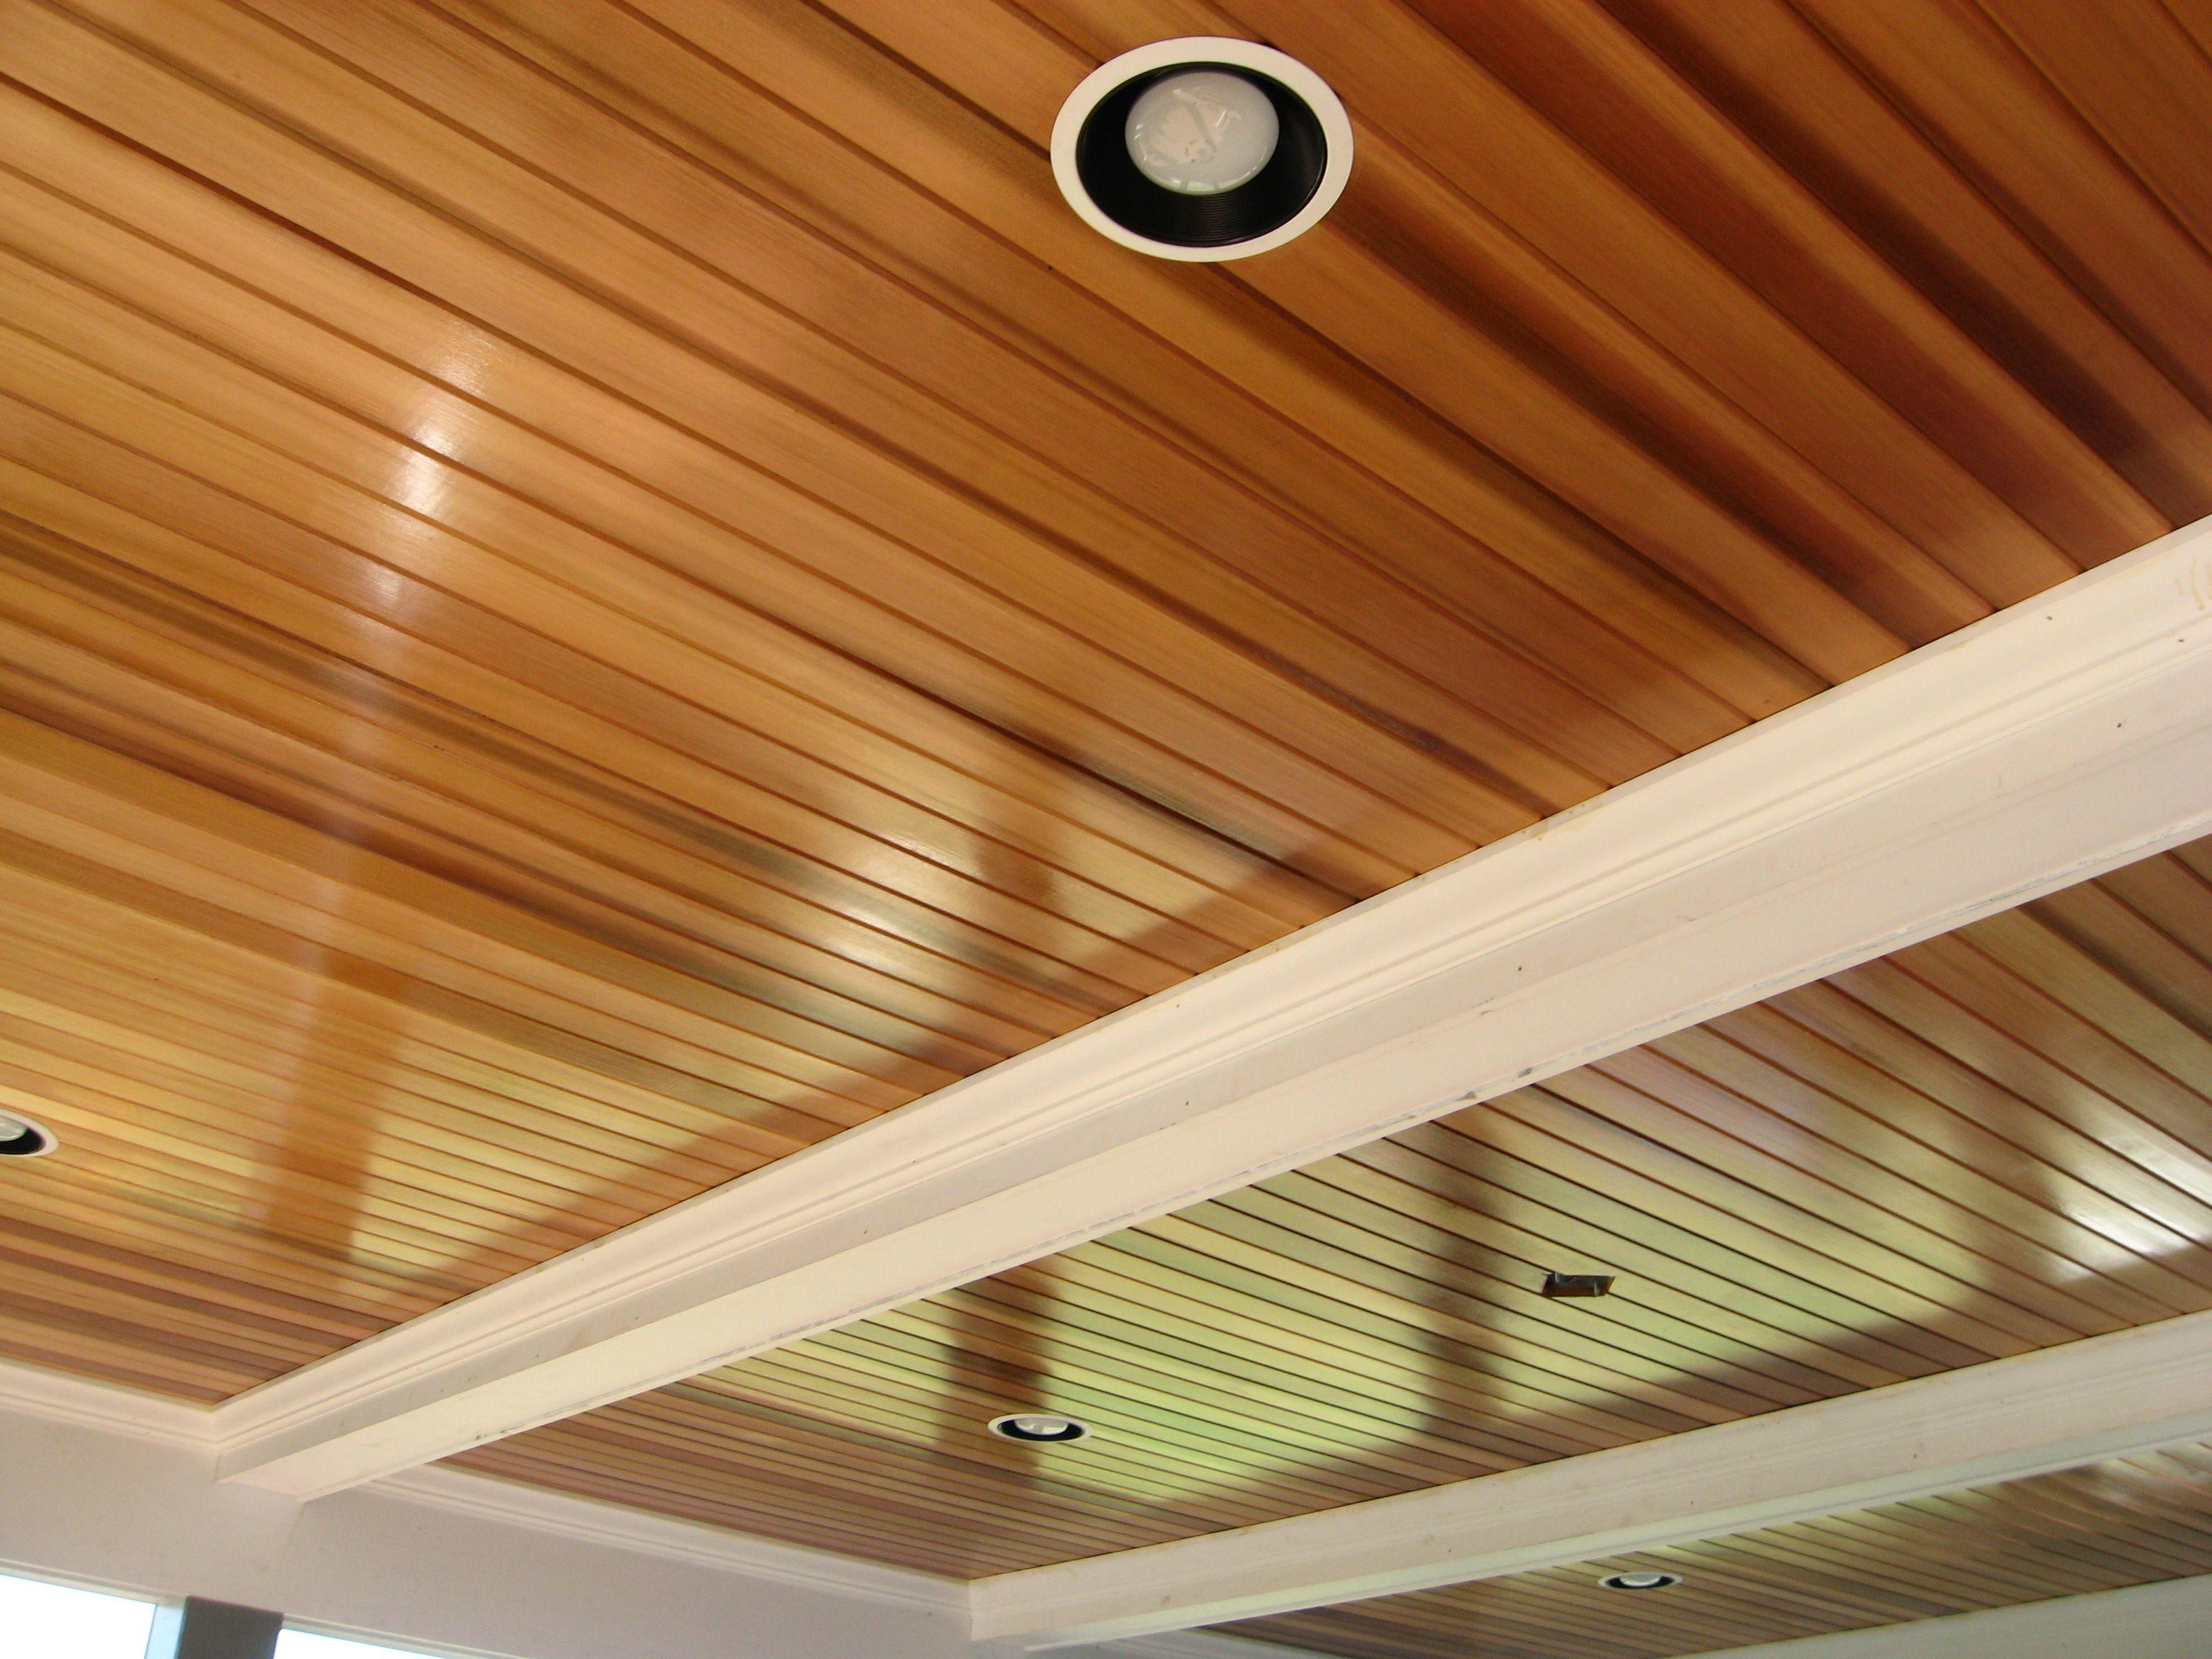 Beautifully Shiny Cedar Ceiling General Interior